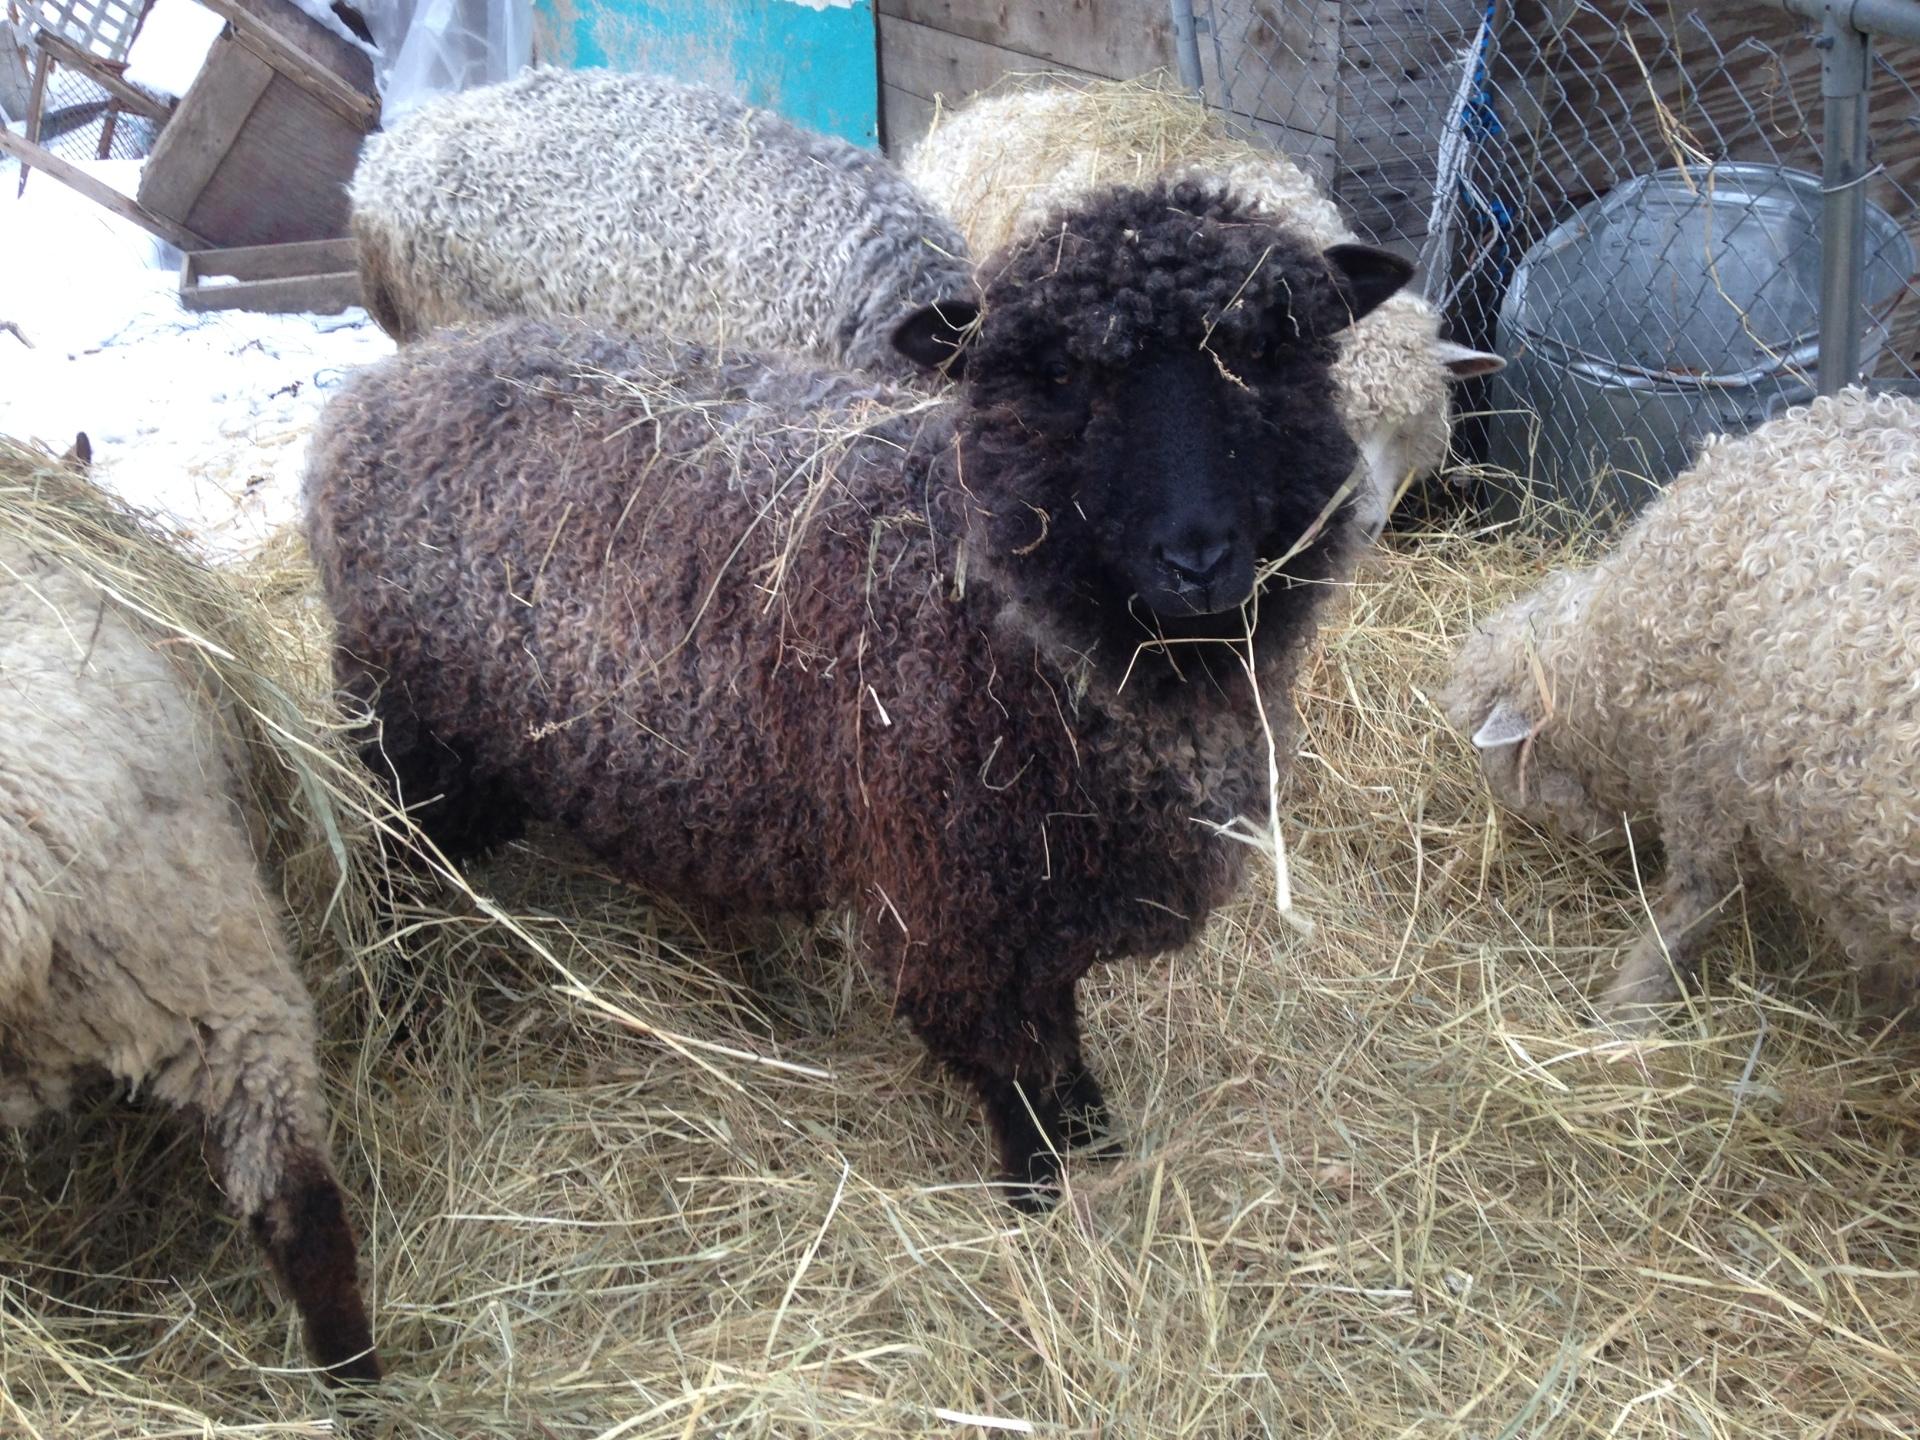 Sheeps Nose Farm EO11 (Julep) C07443 C06153 / C05458